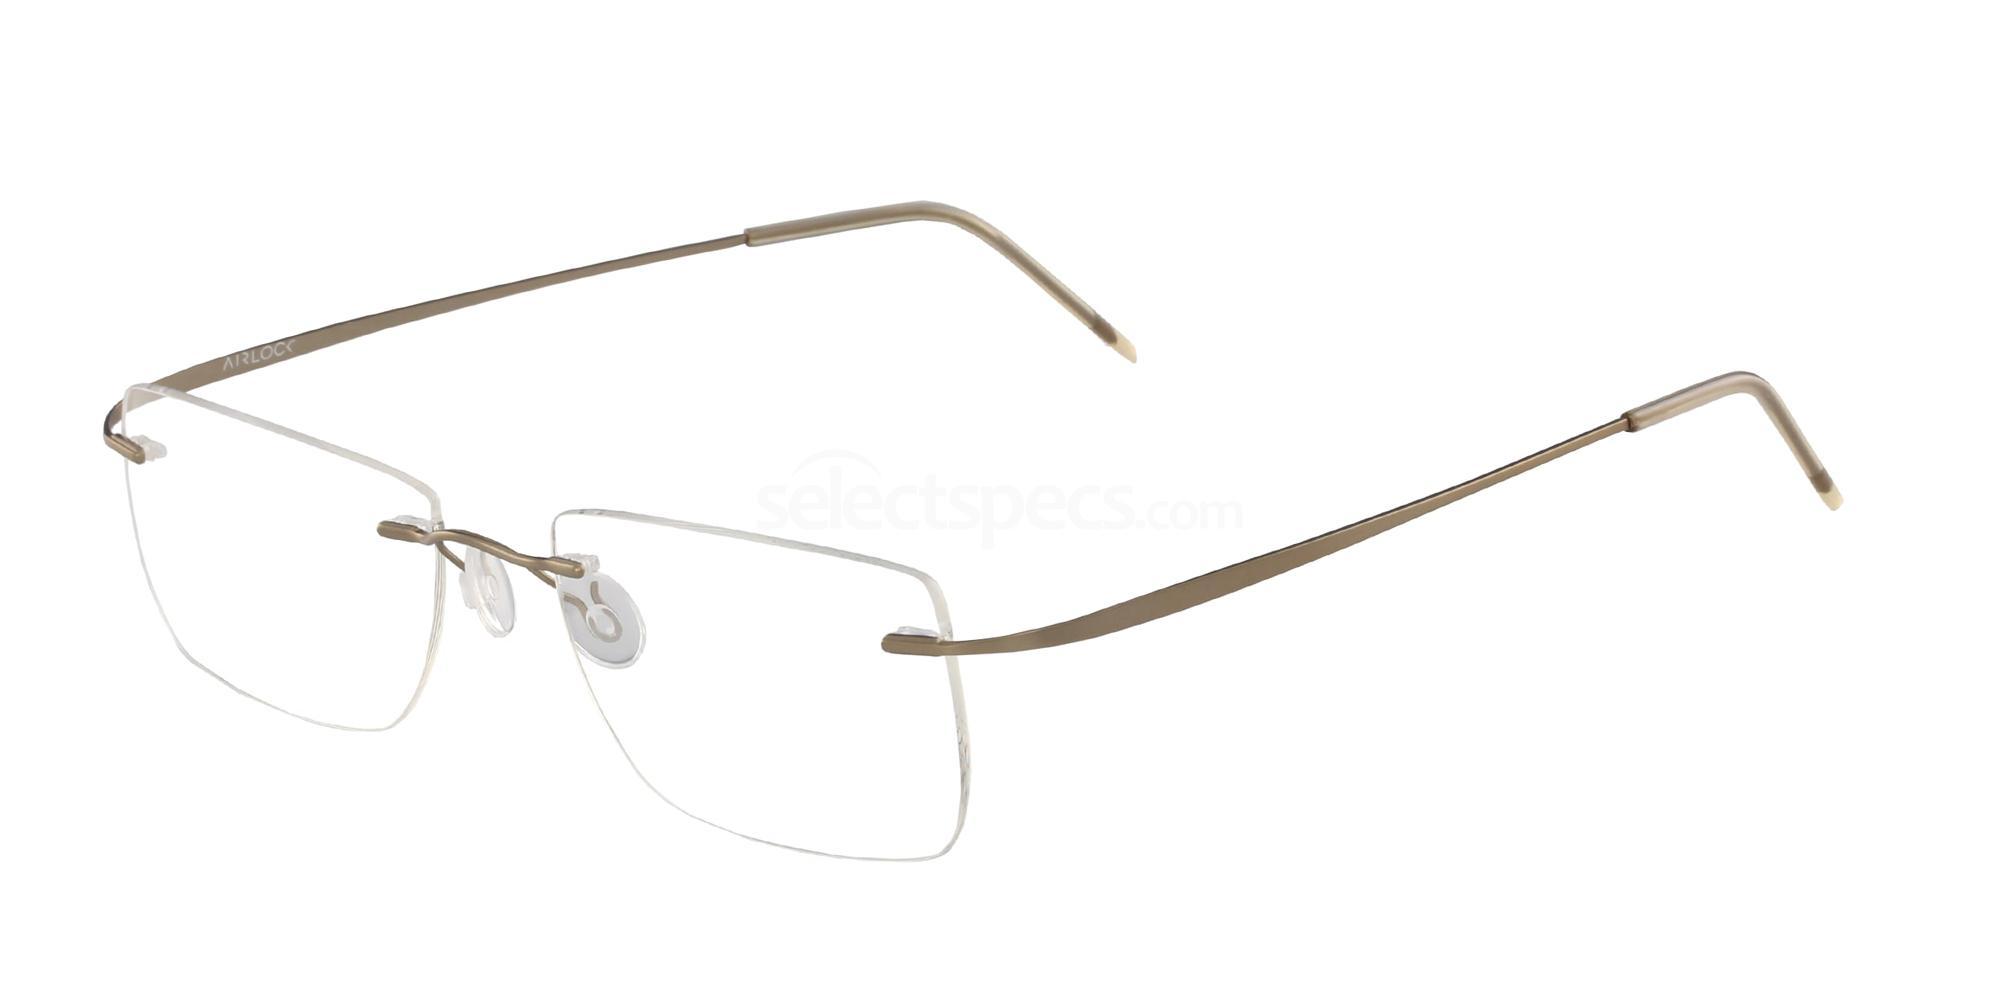 710 ELEMENT 203 Glasses, AIRLOCK